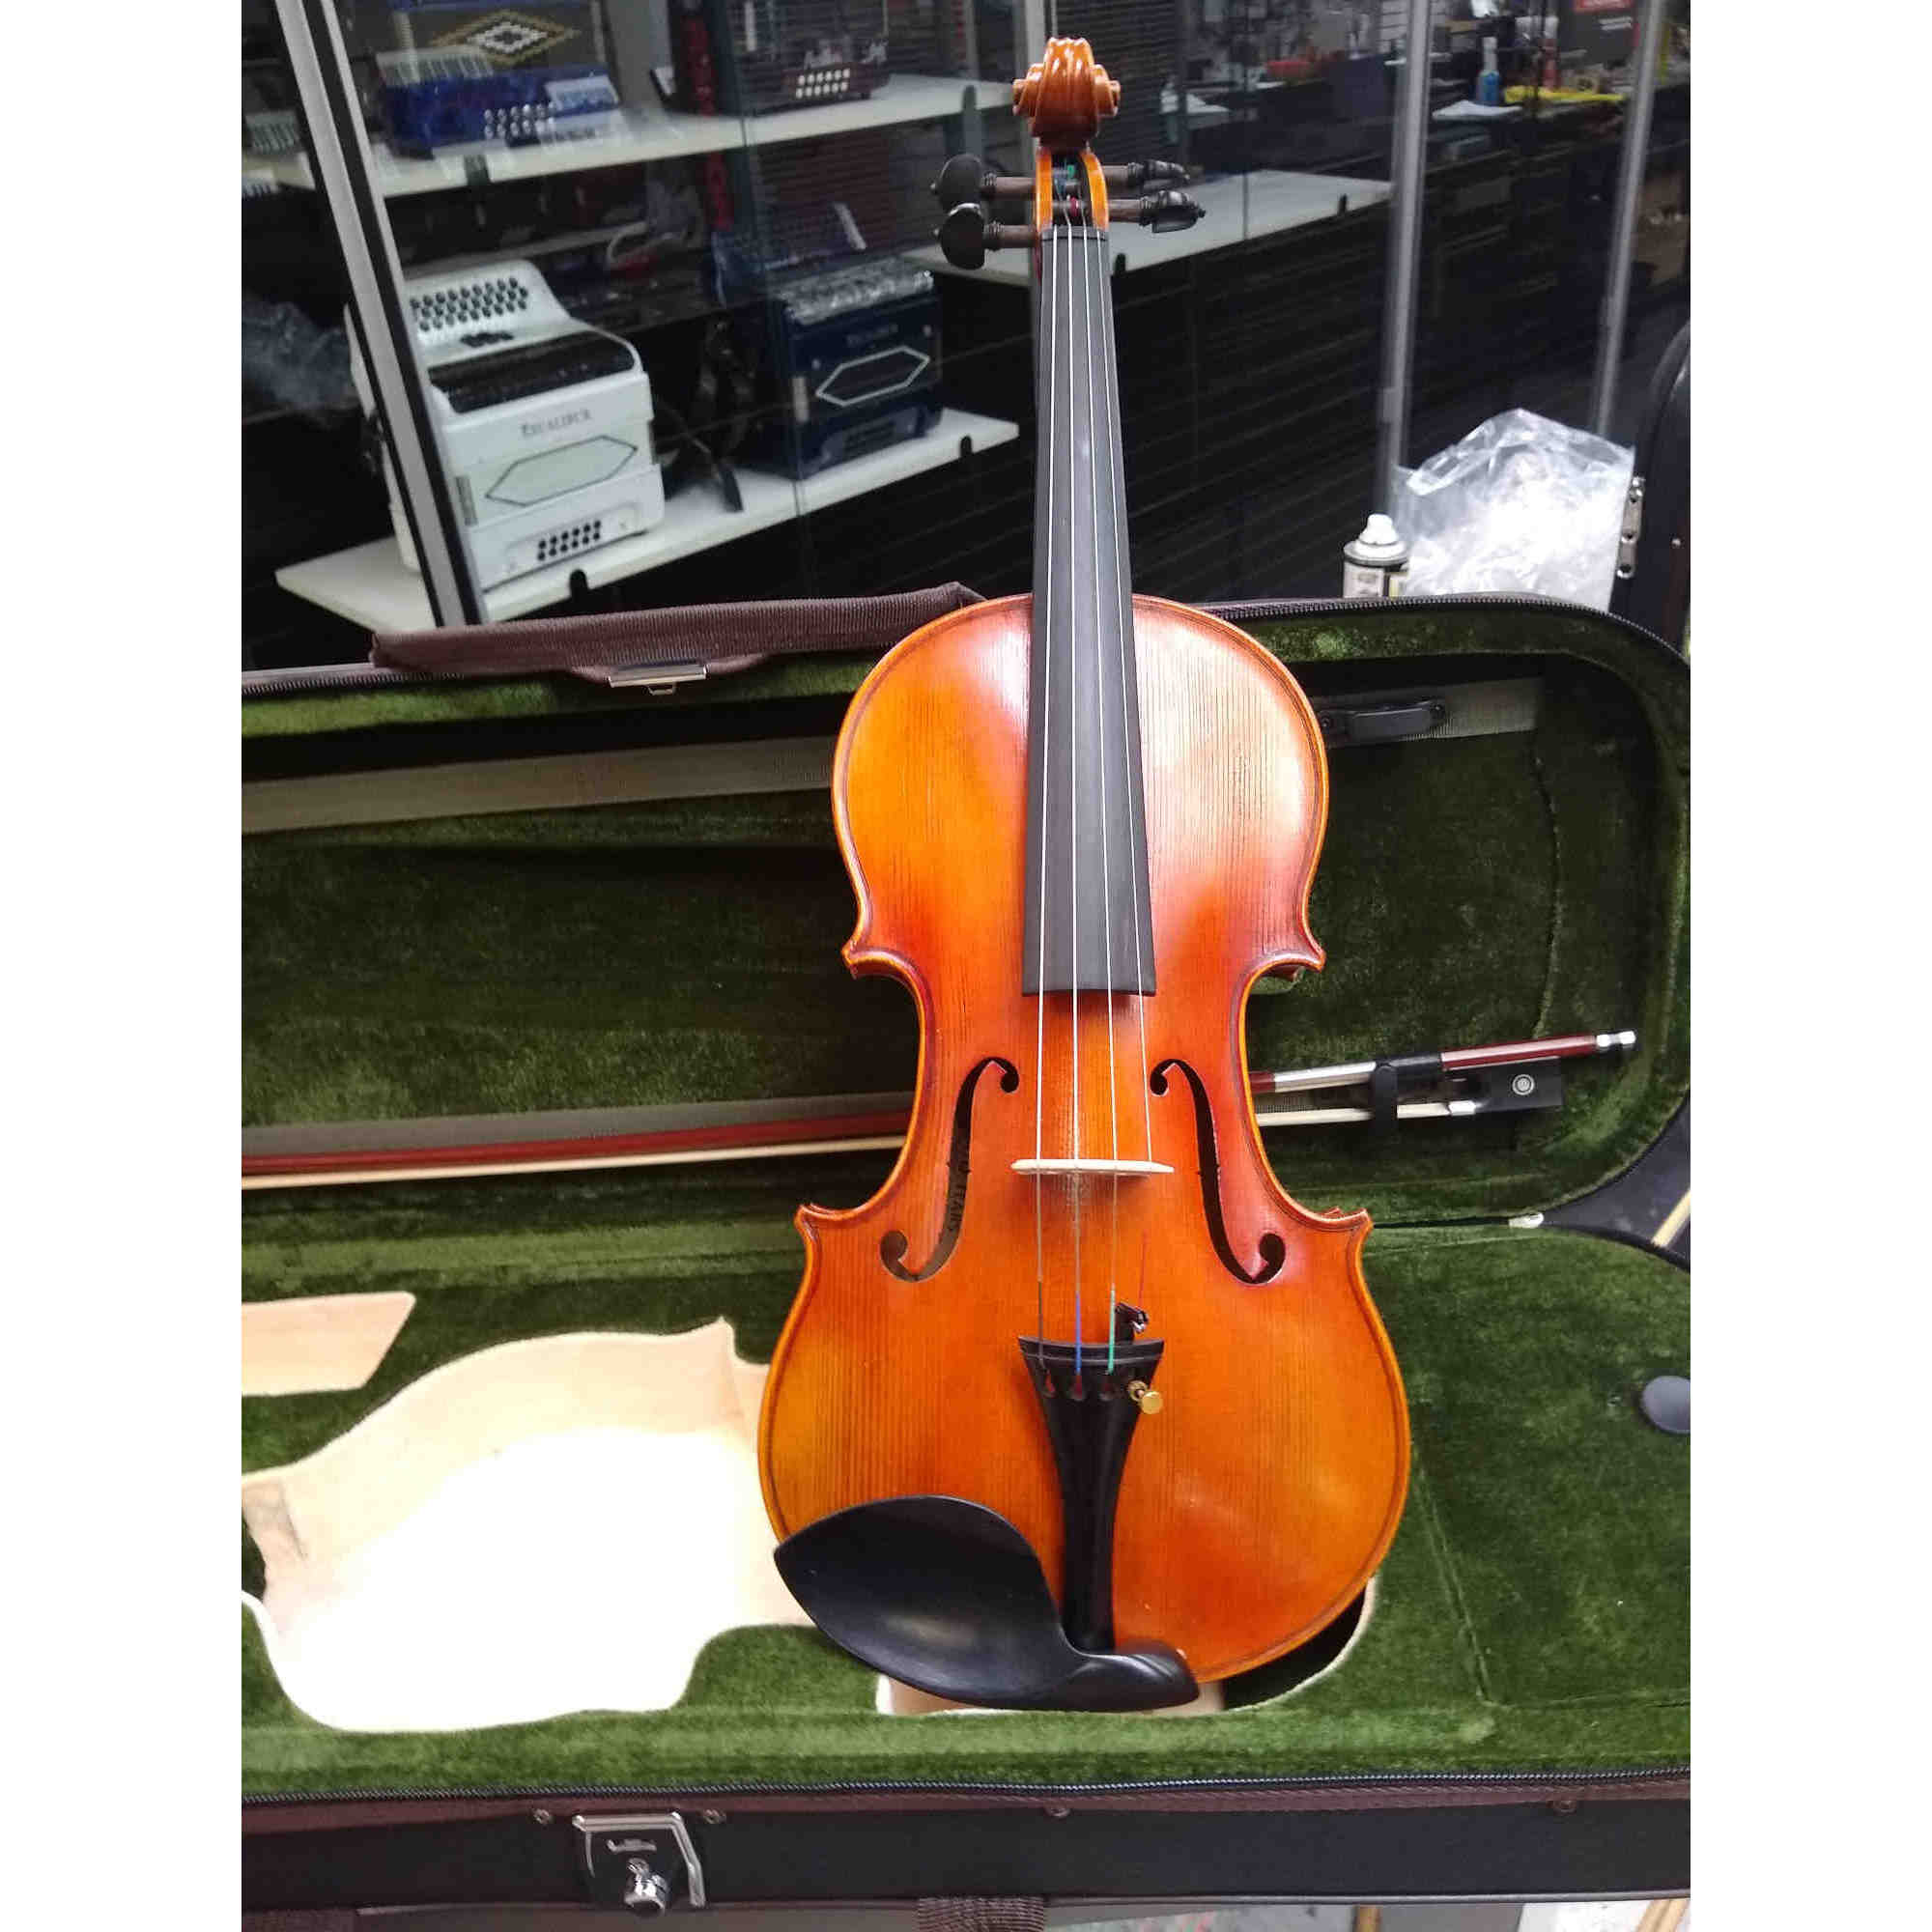 Vienna Strings Munich Violin 4/4 New For 2021 Cherry Stain